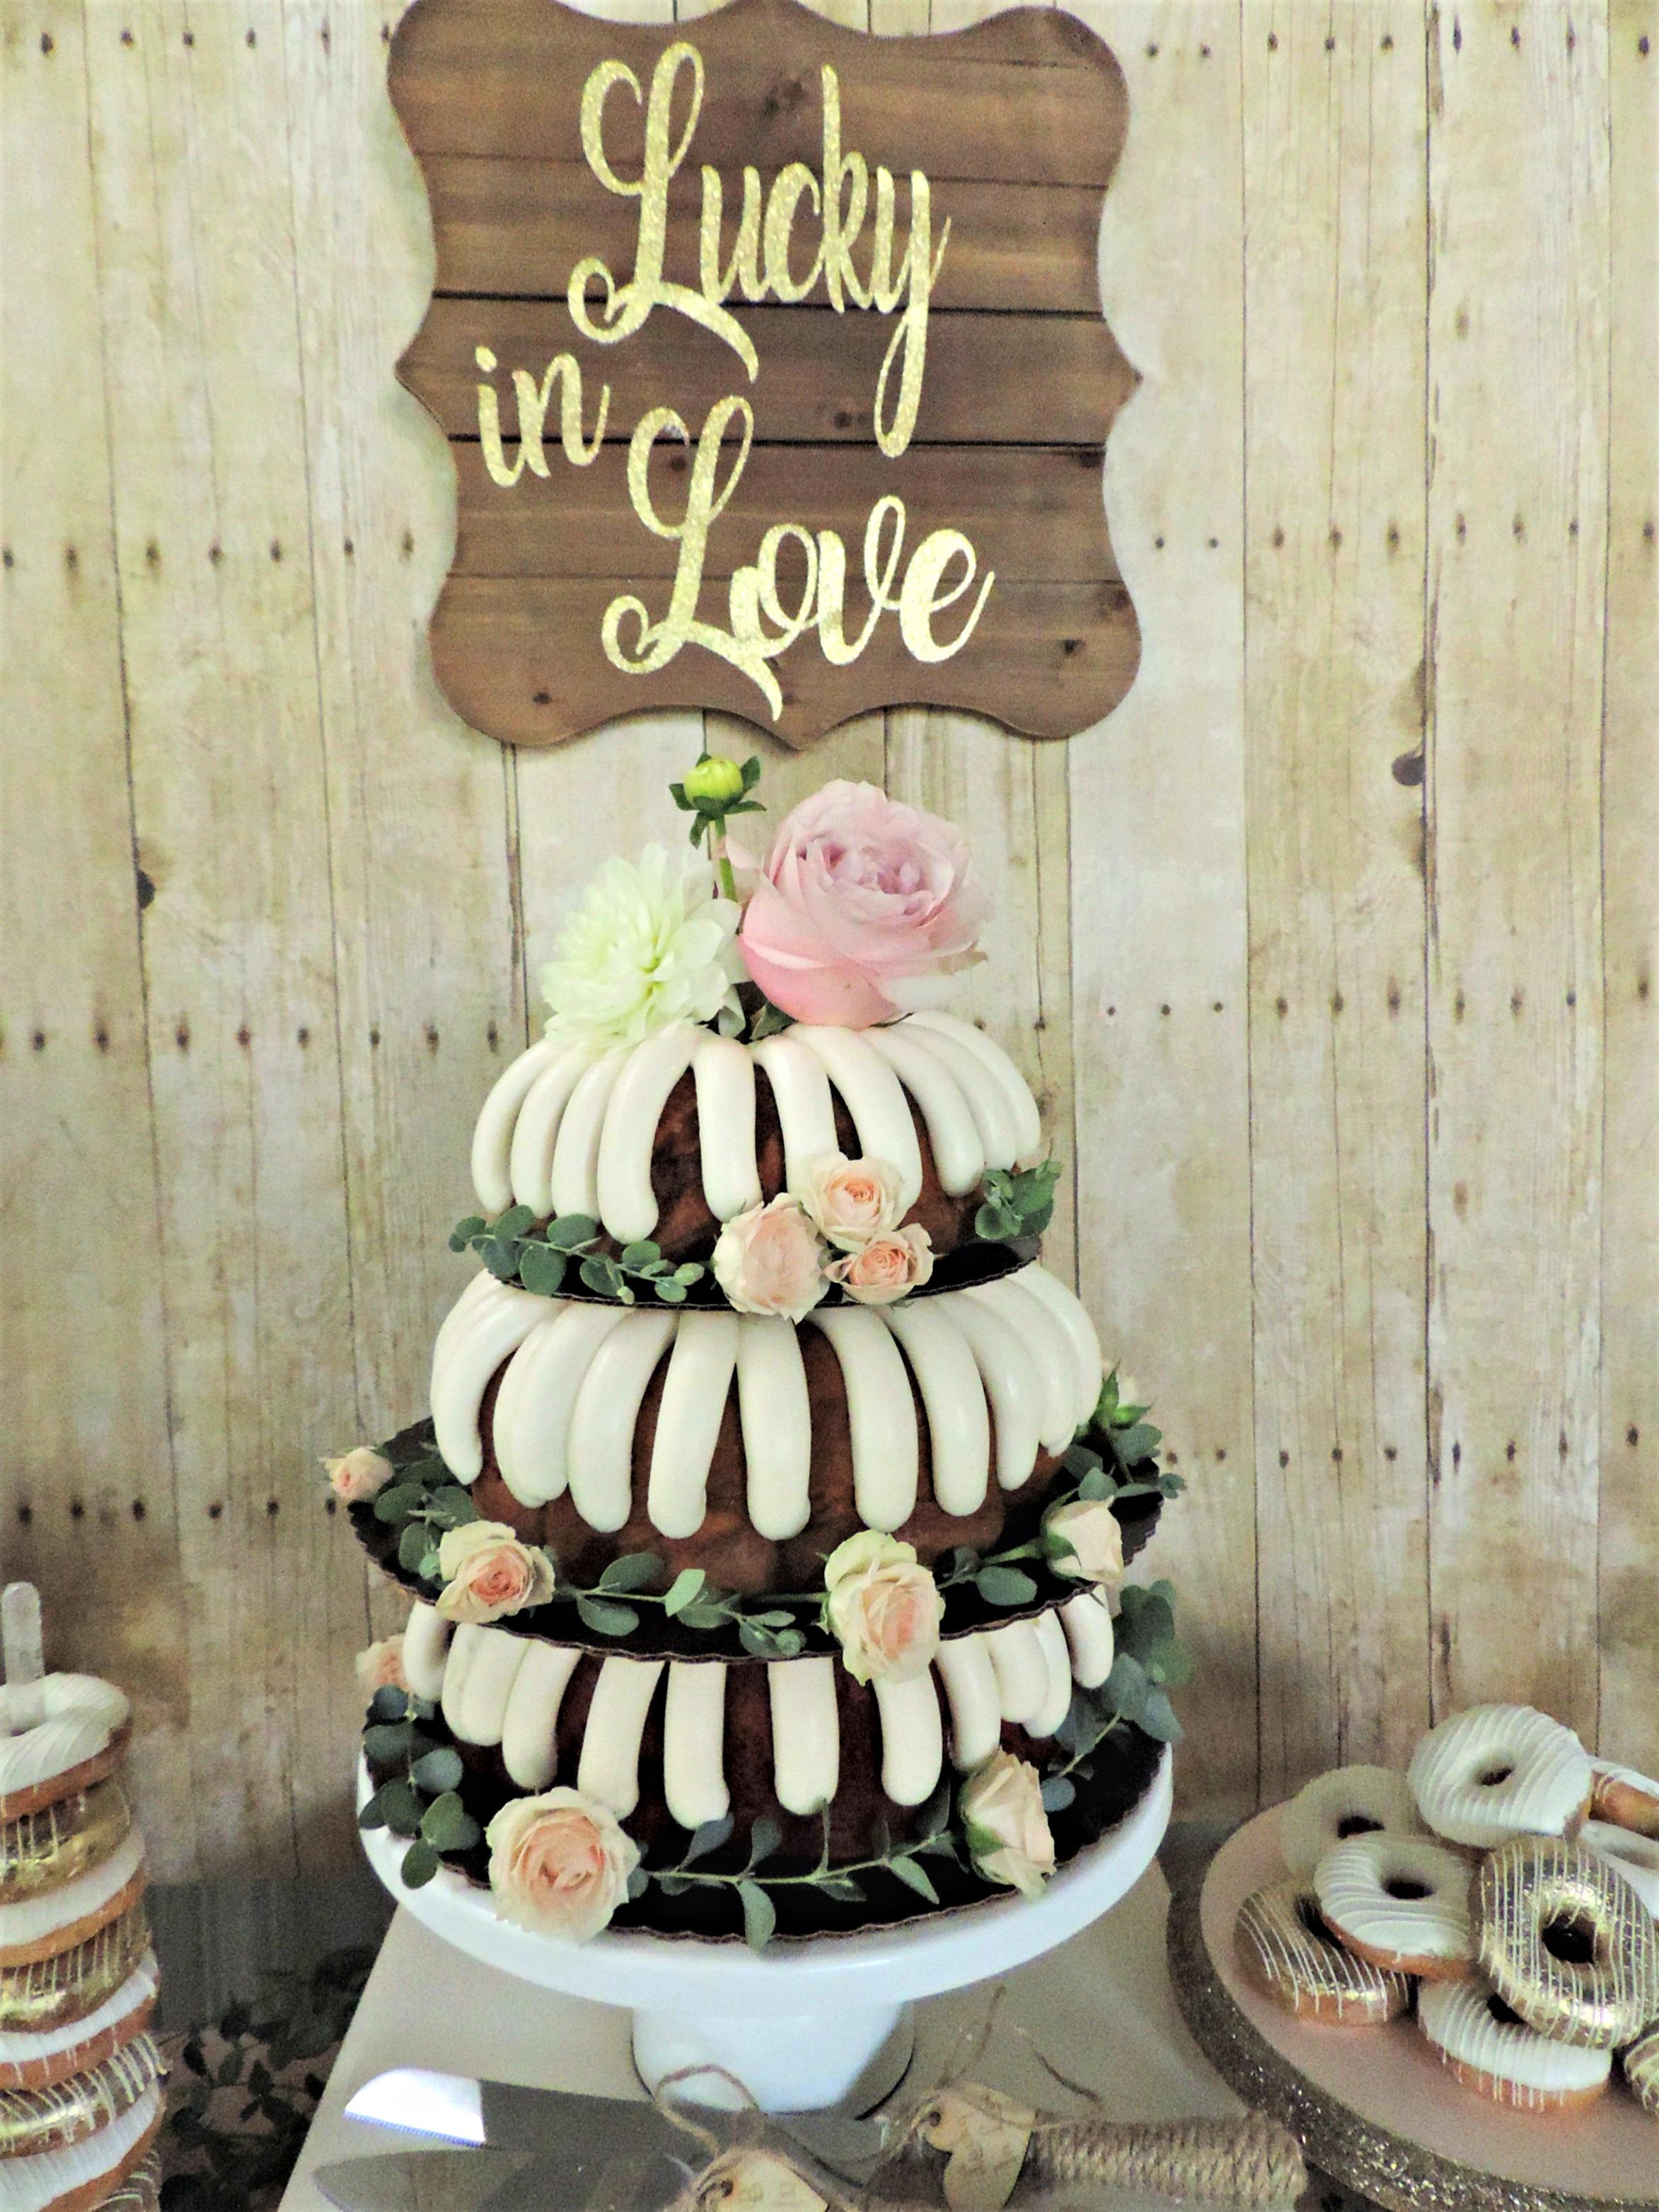 Nothing Bundt Cake-Wedding Cake-Rustic Wedding-Blush Pink Wedding-Bundt Wedding Cake-www.SugarPartiesLA.com.jpg